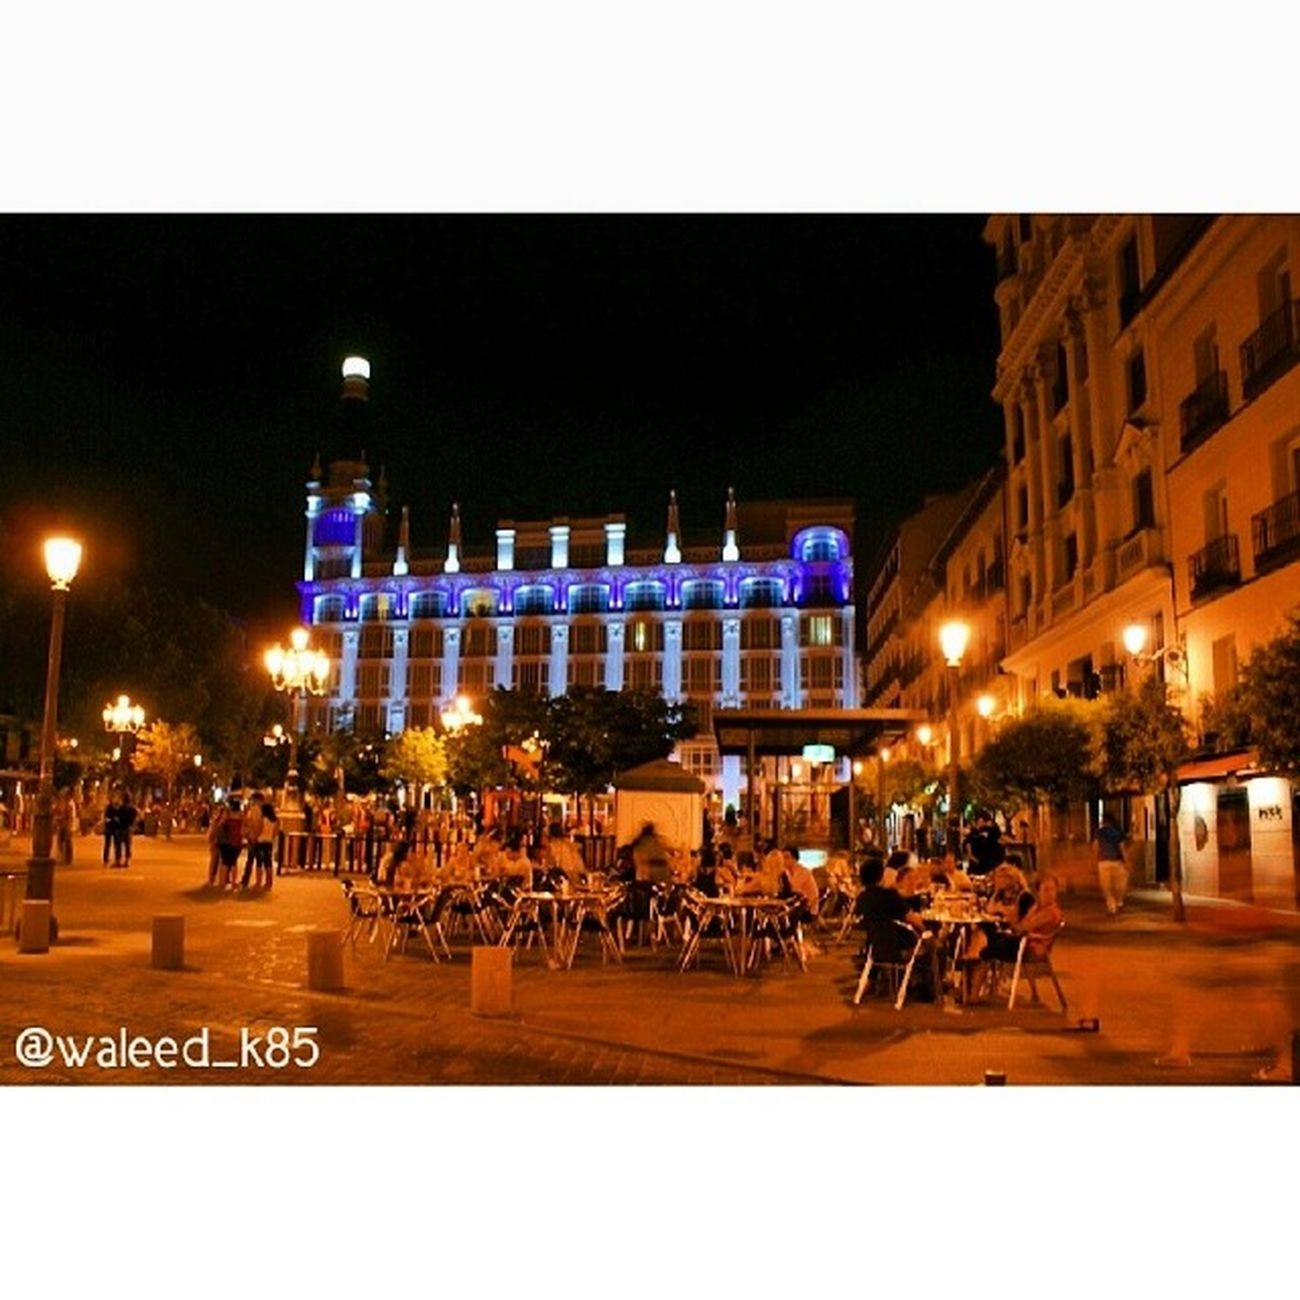 HotelMe MeMadrid Hotel at the PlazaSantaAna MadridSpain españa. Taken by my sonyalpha dslr a200. Taken in my 2010 summer trip مدريد اسبانيا فندق